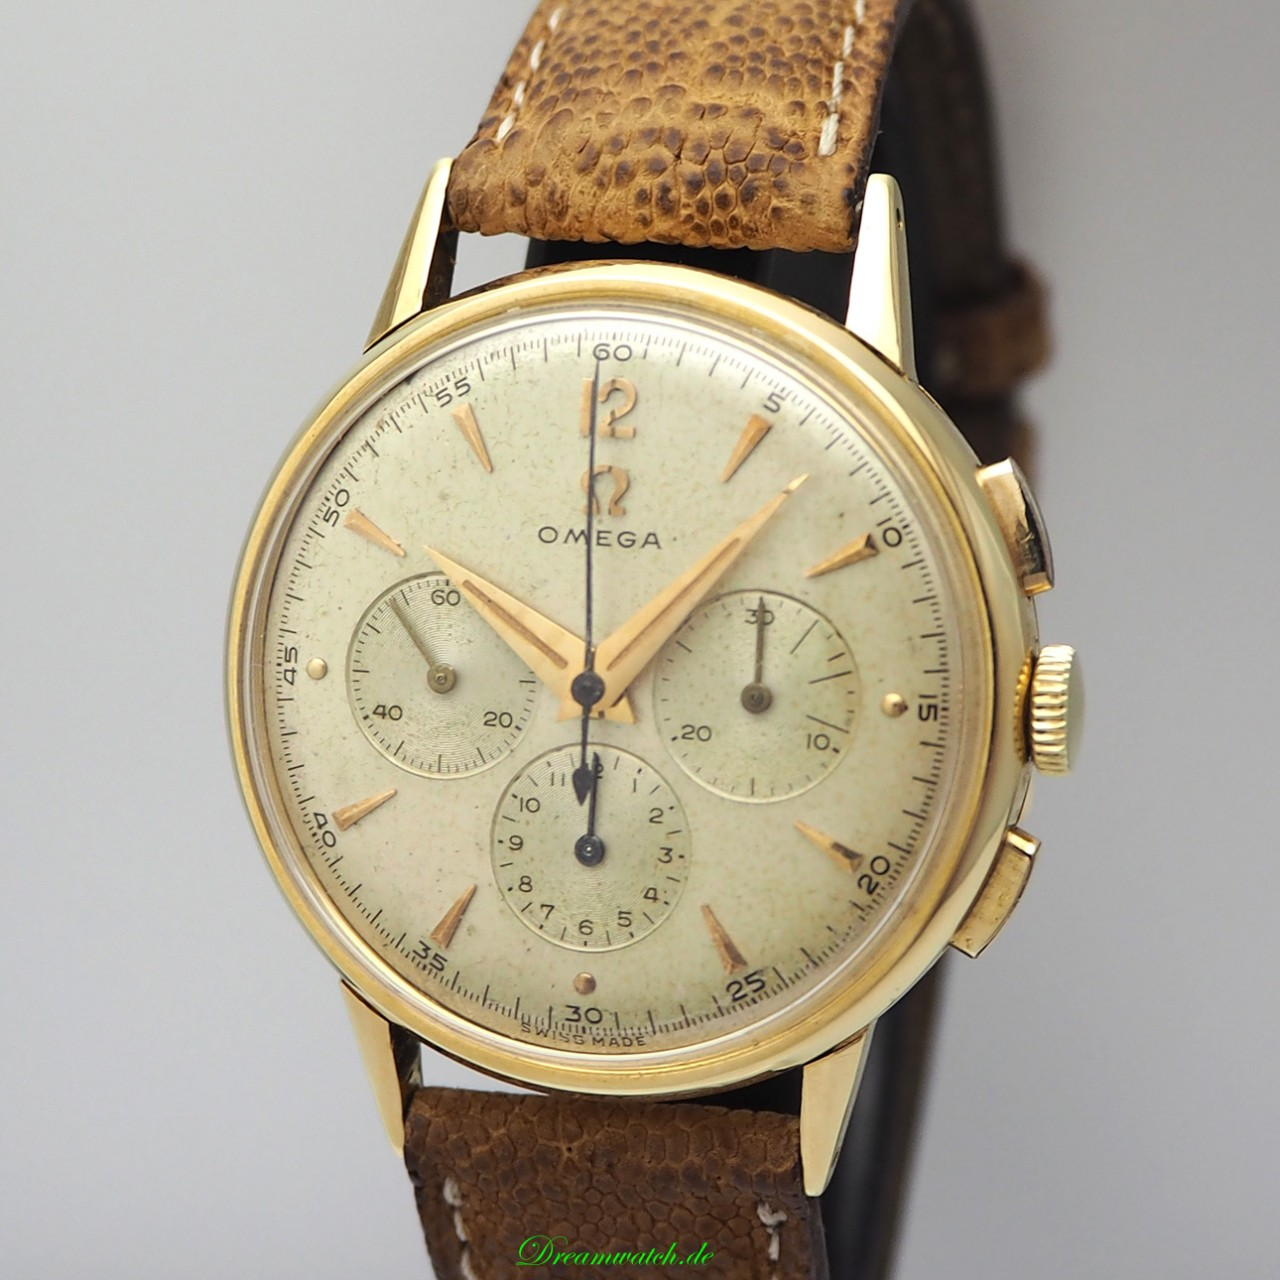 Omega Vintage Chronograph 3-Register Ref.: 2279 / Cal. 321 -18k/ 750 Gold from 1956